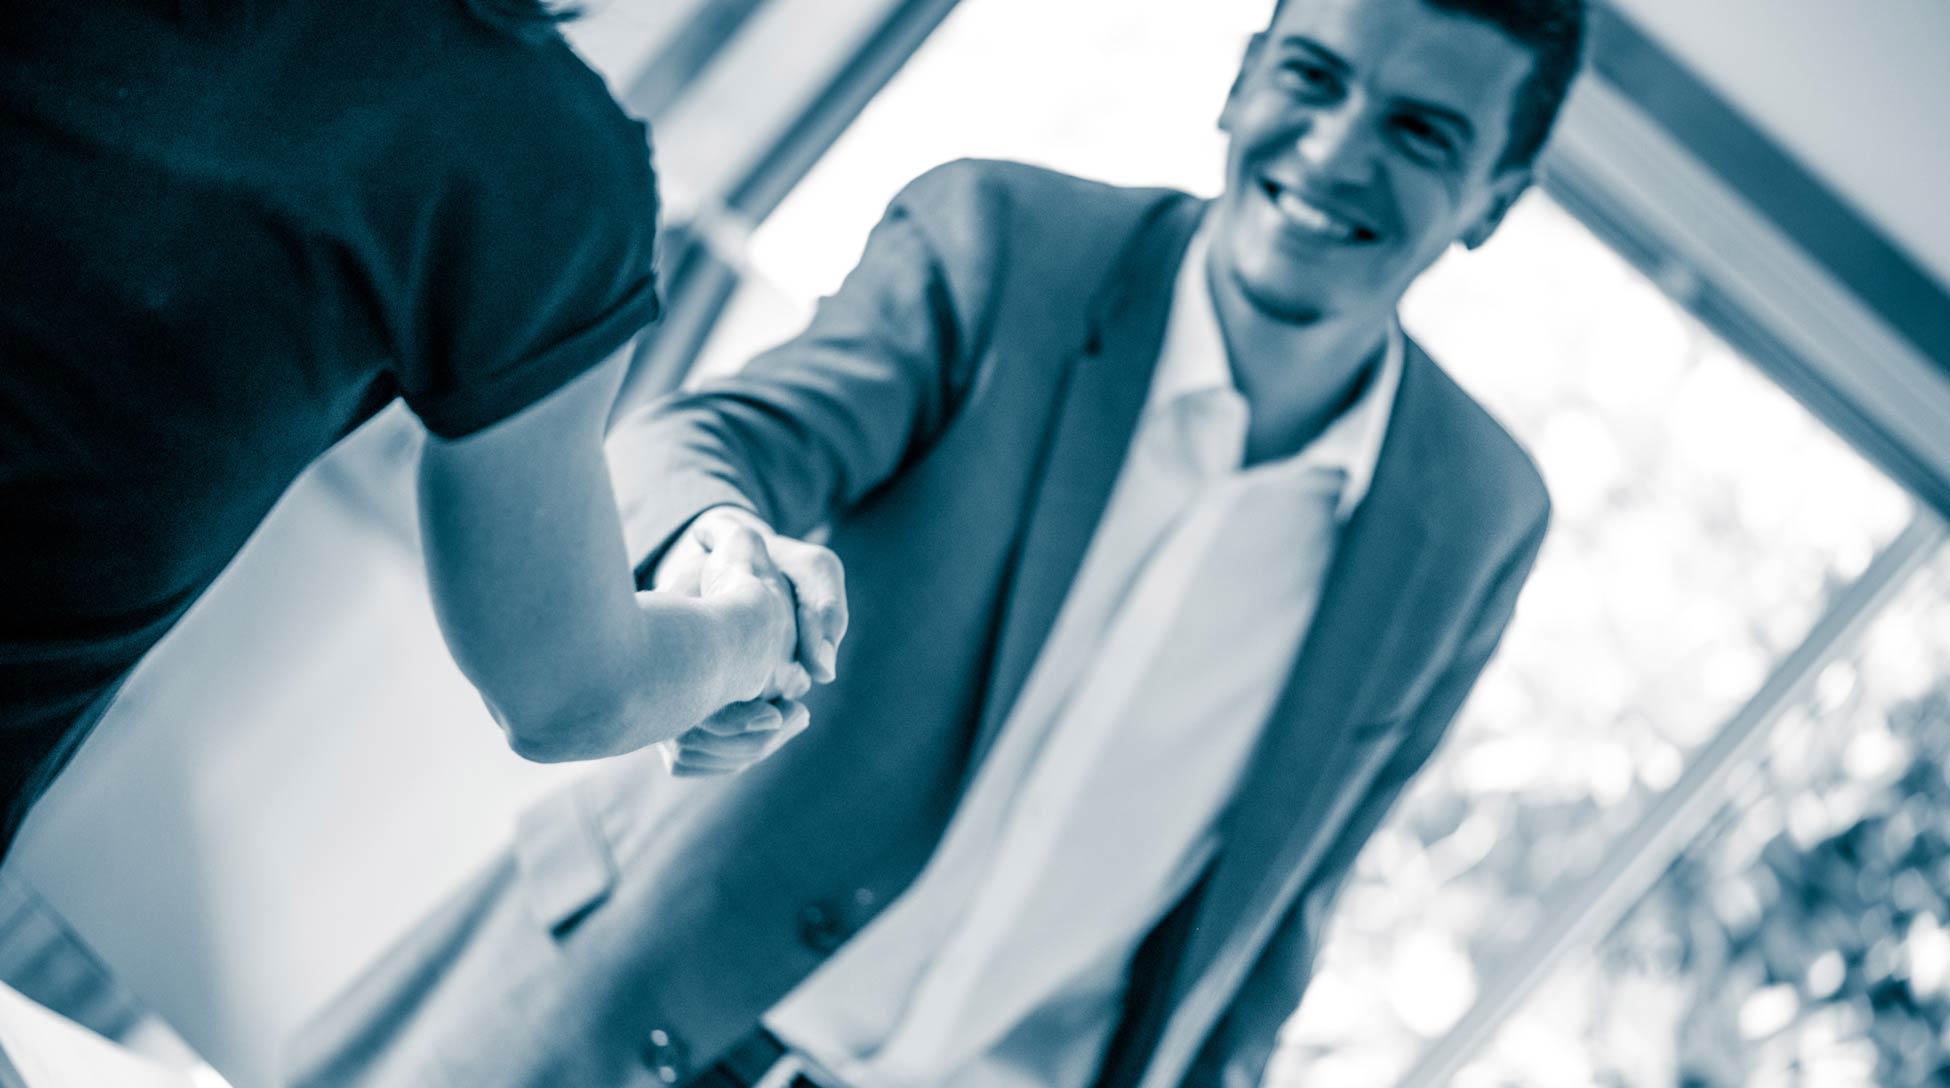 conseiller-dirigeant-entreprise-haute-gironde